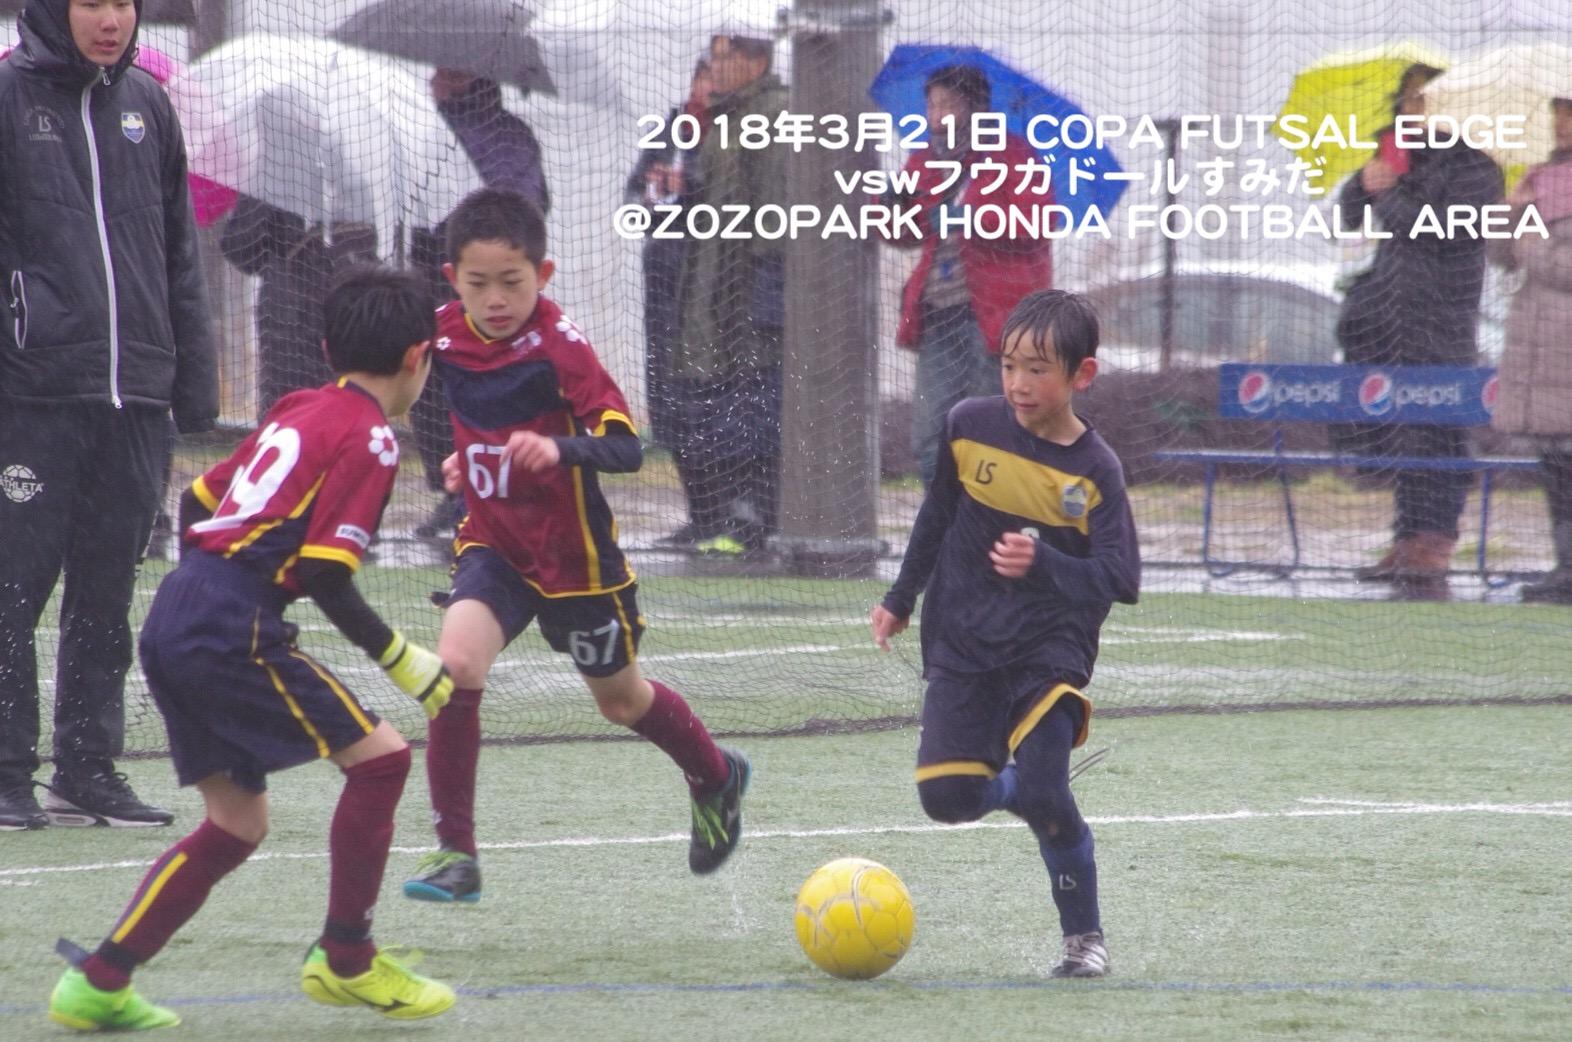 180321 FutsalEdge